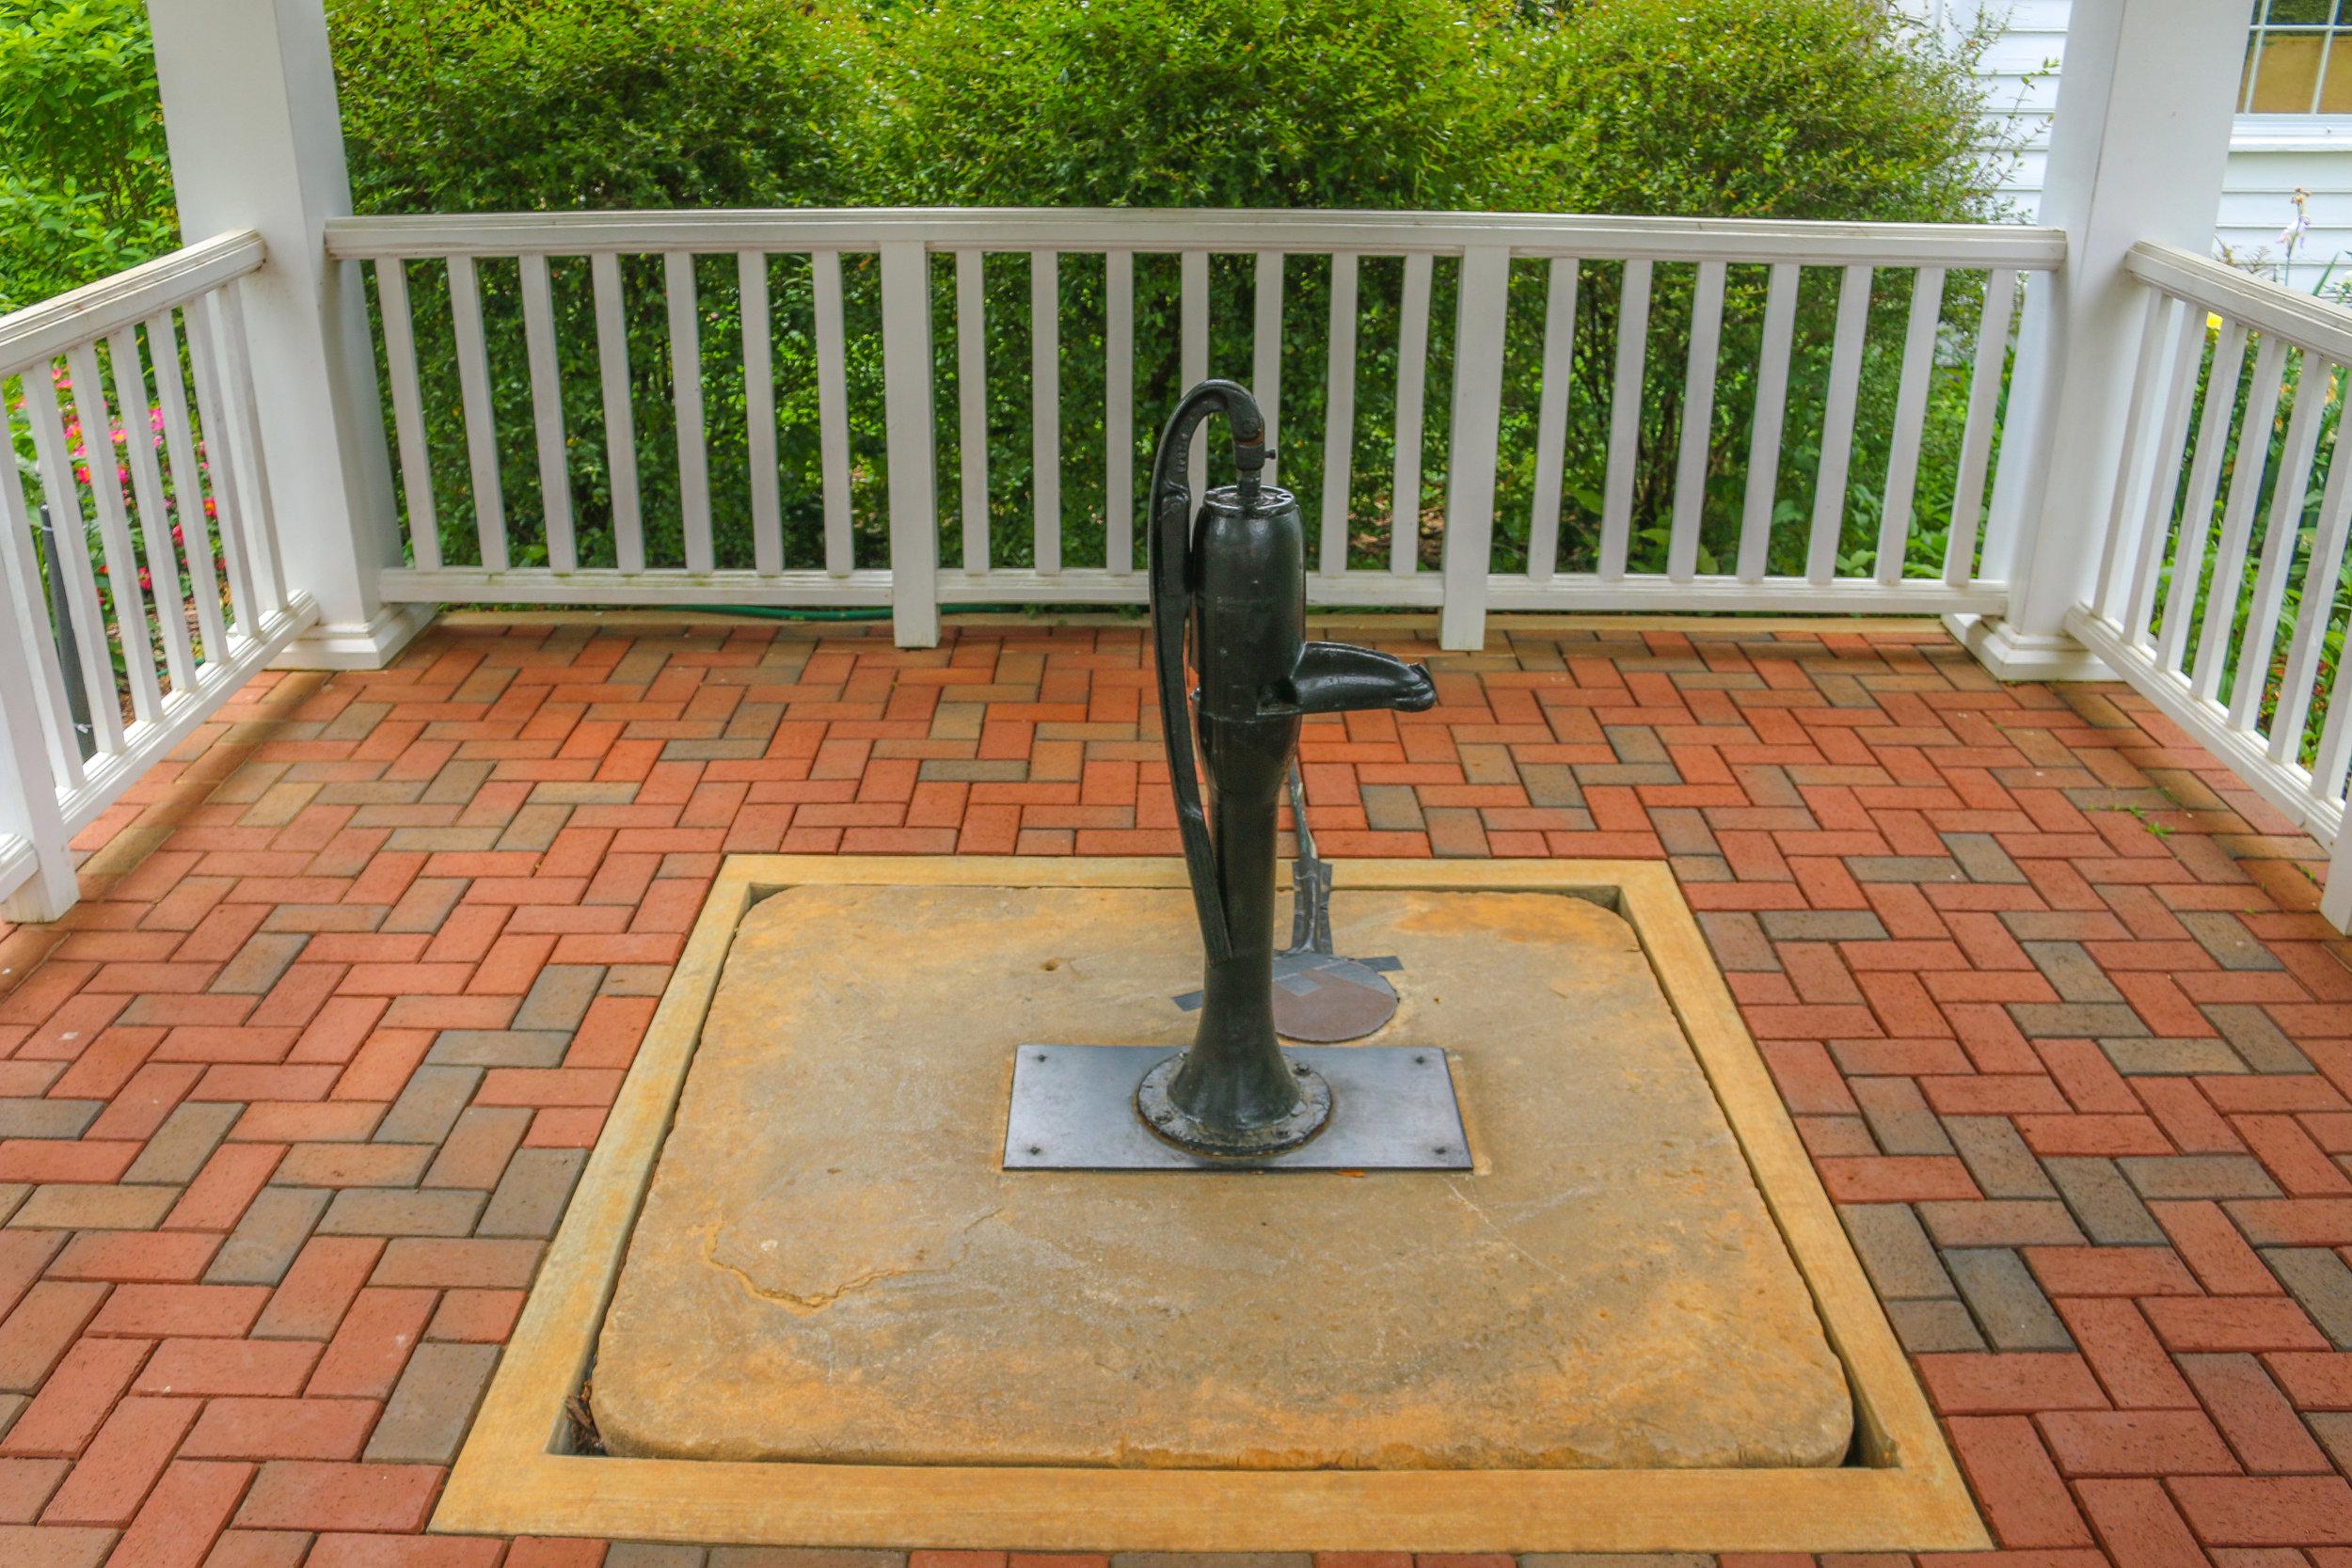 Helen Keller's Water Pump